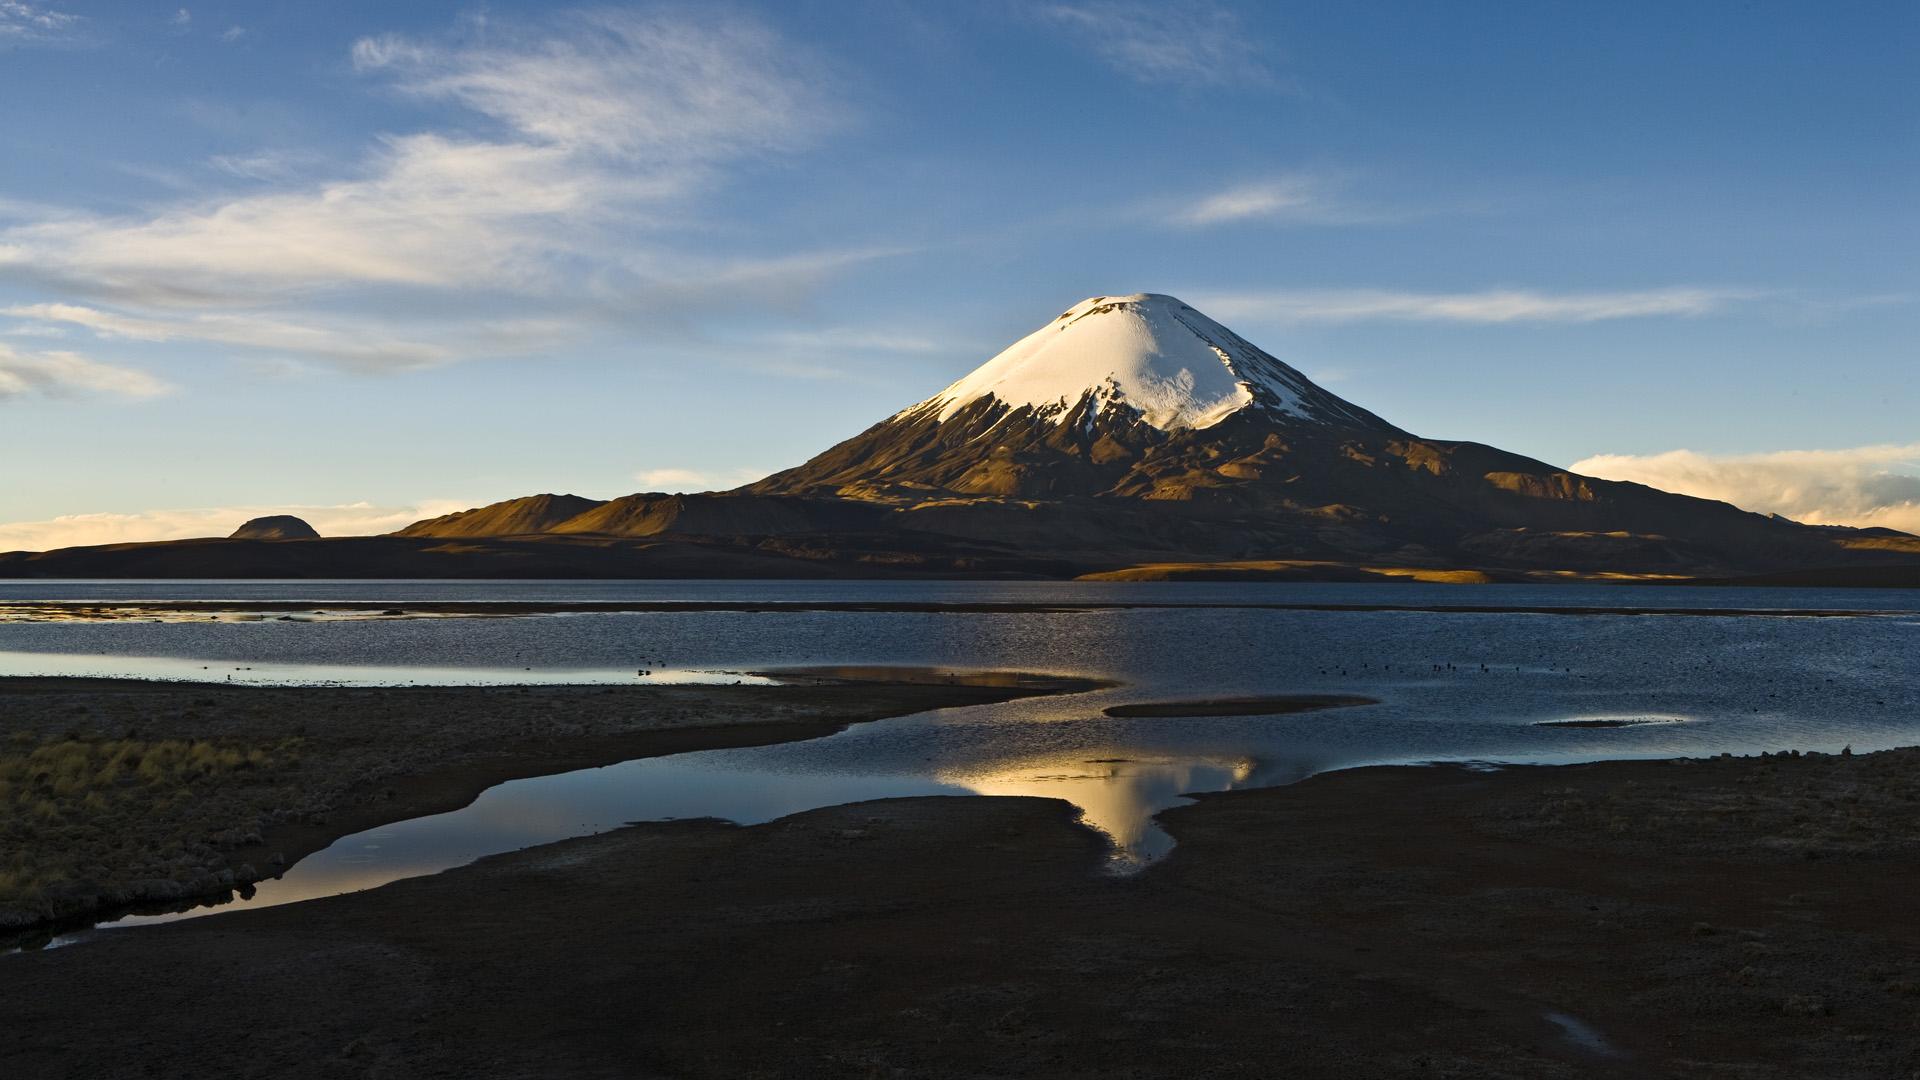 Parinacota Volcano HD Wallpaper Background Images 1920x1080